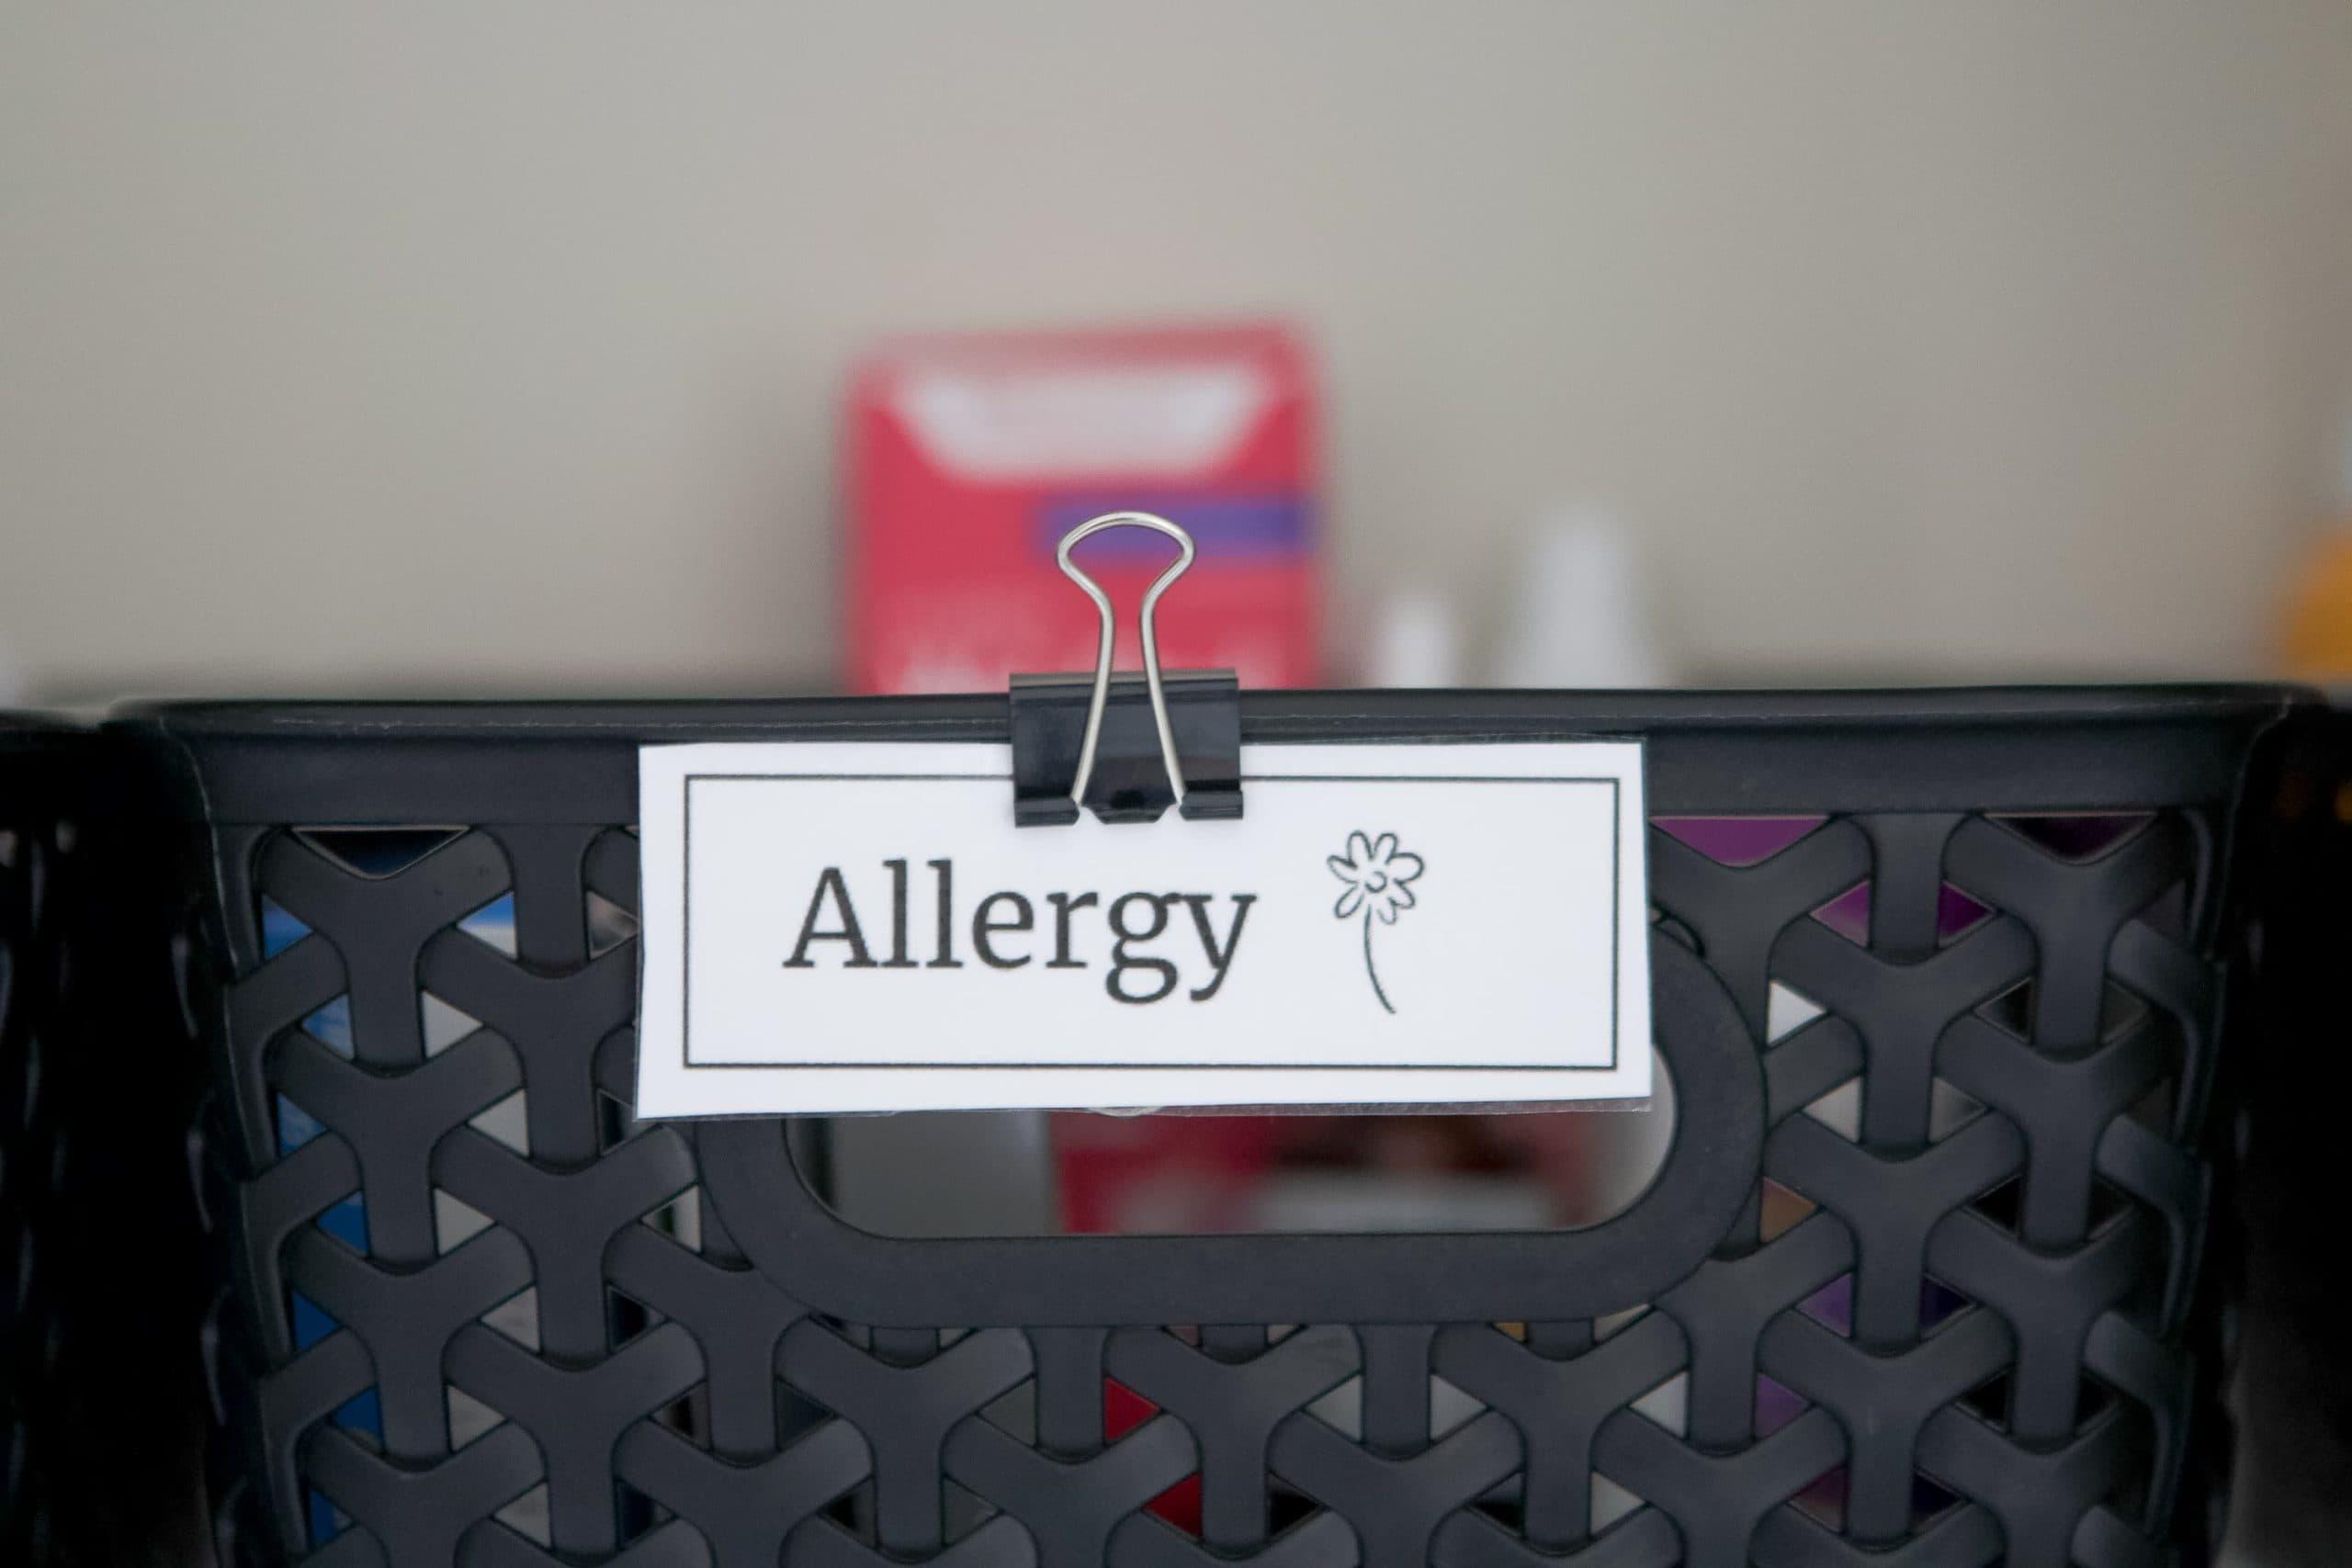 Make labels to help you organize medicine